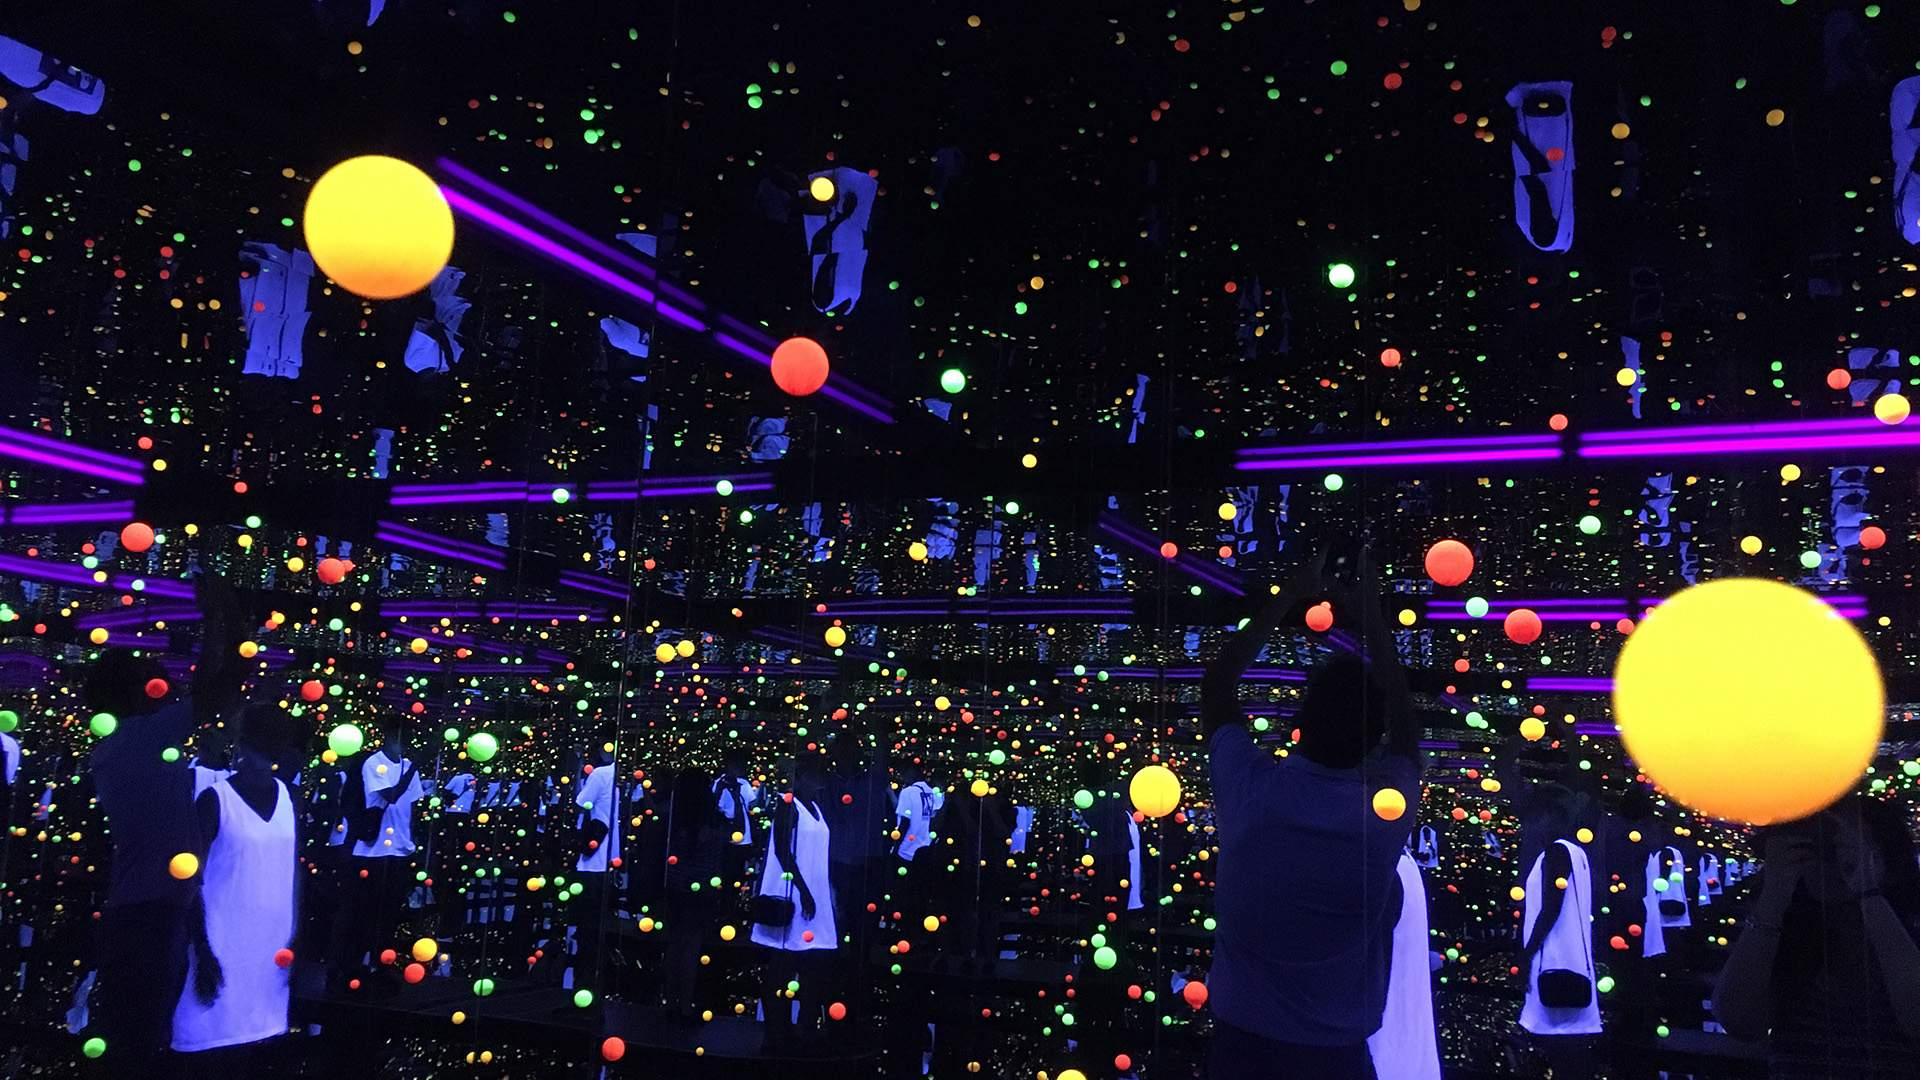 A Look Inside GOMA's Kaleidoscopic 'Yayoi Kusama: Life Is the Heart of a Rainbow' Exhibition